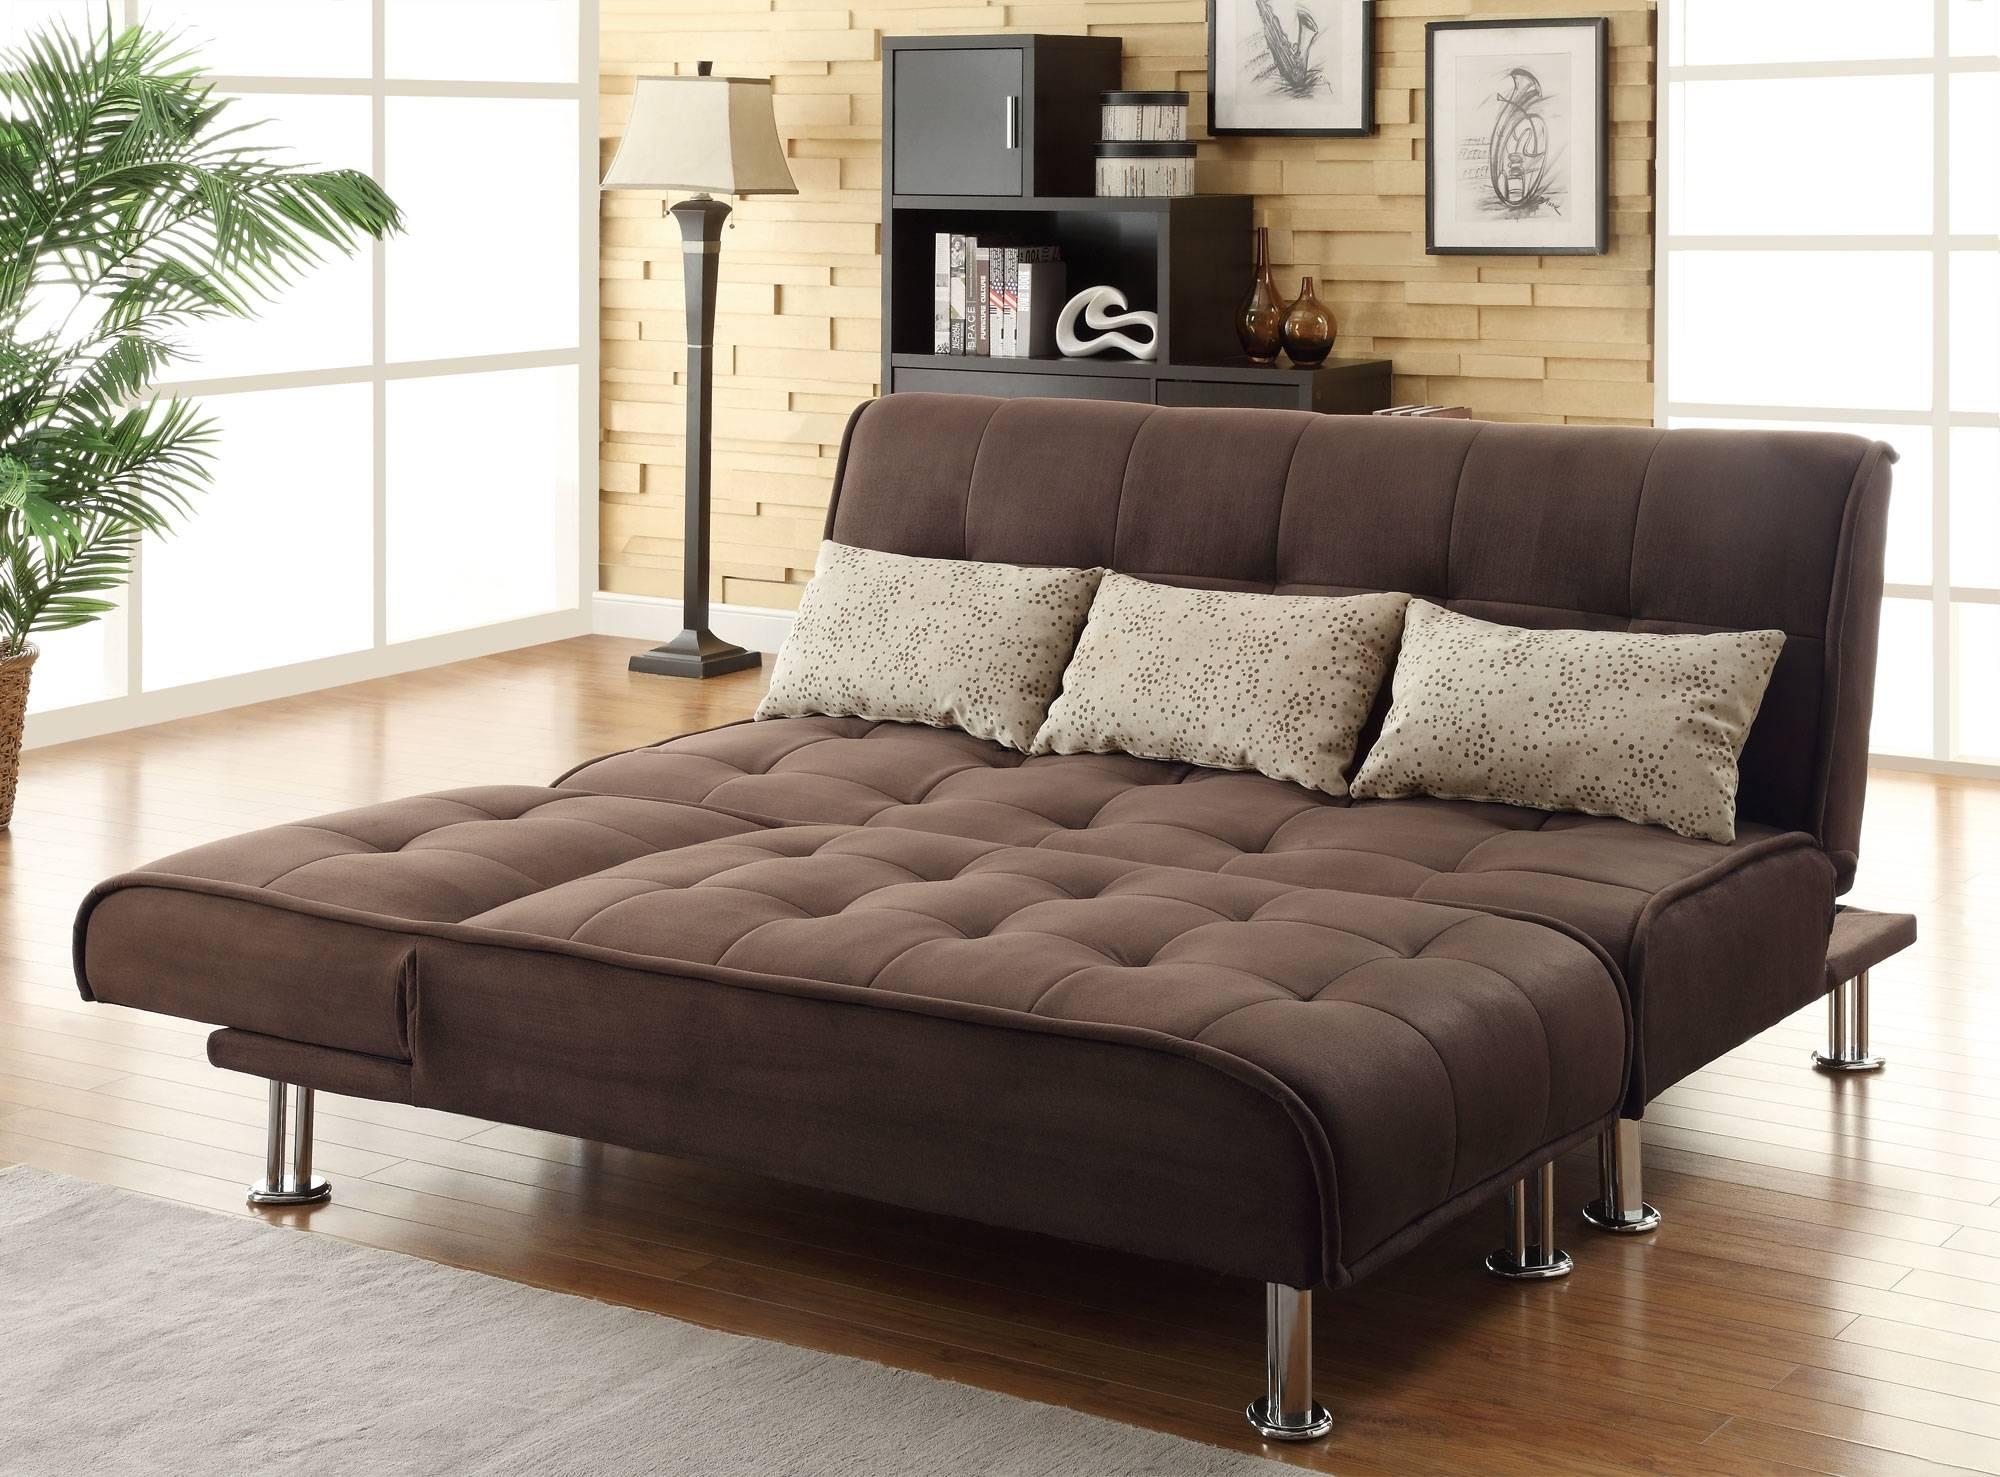 Sofas Center : Sleeper Sofa With Tempurpedic Mattress throughout King Size Sleeper Sofa Sectional (Image 23 of 30)